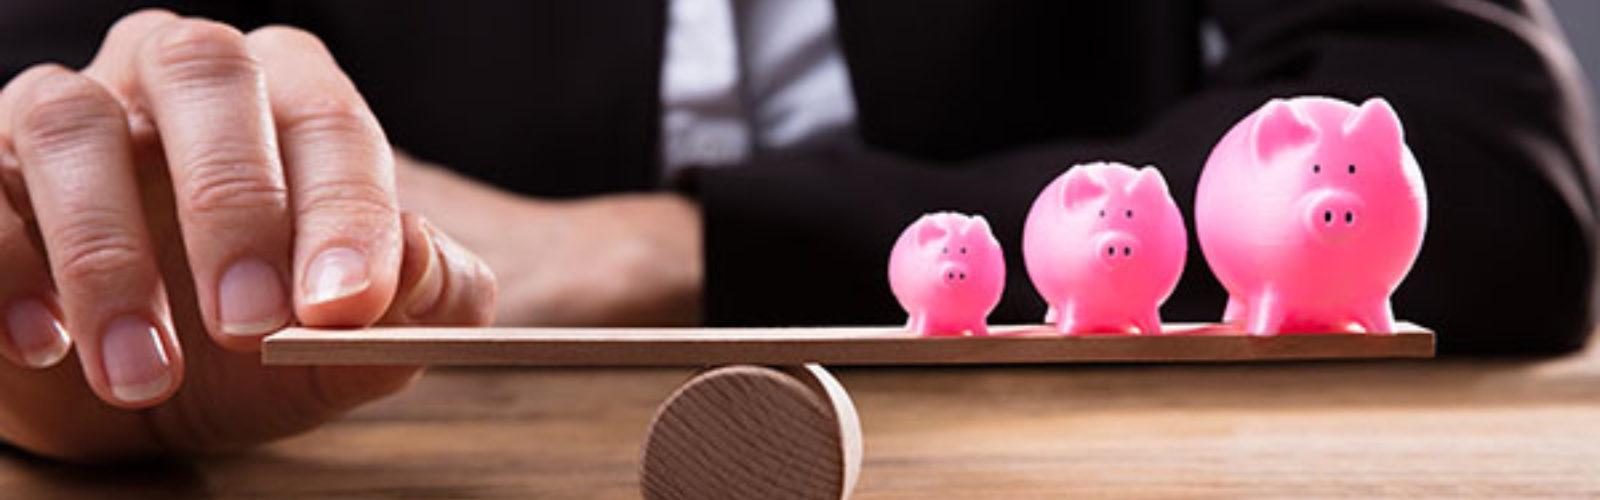 Piggybank on seesaw(bs239009110)_web.jpg 1